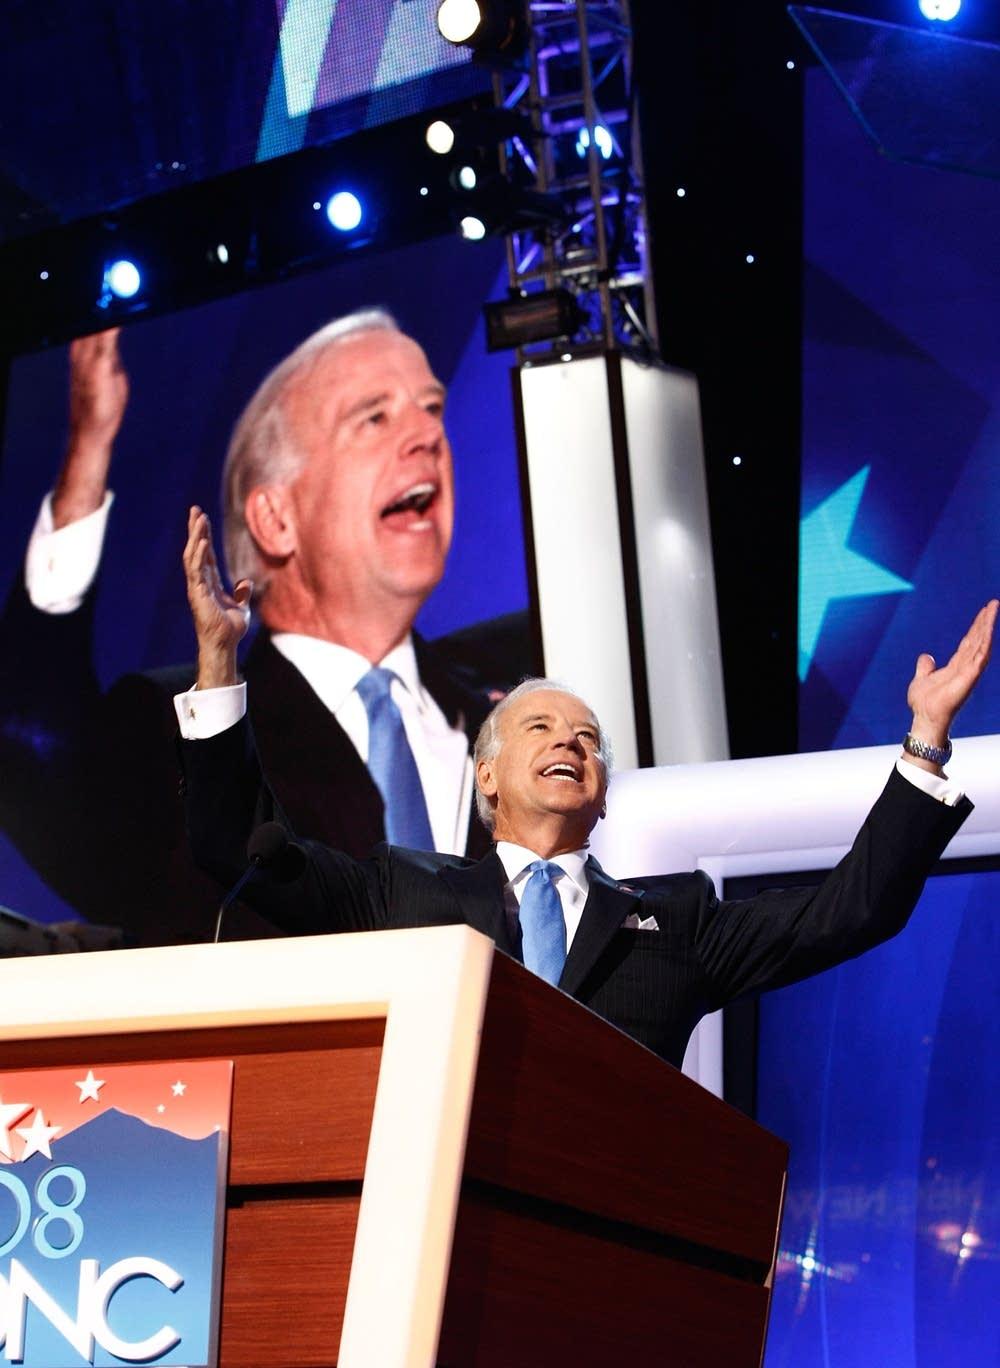 Joe Biden cheers delegates at the DNC